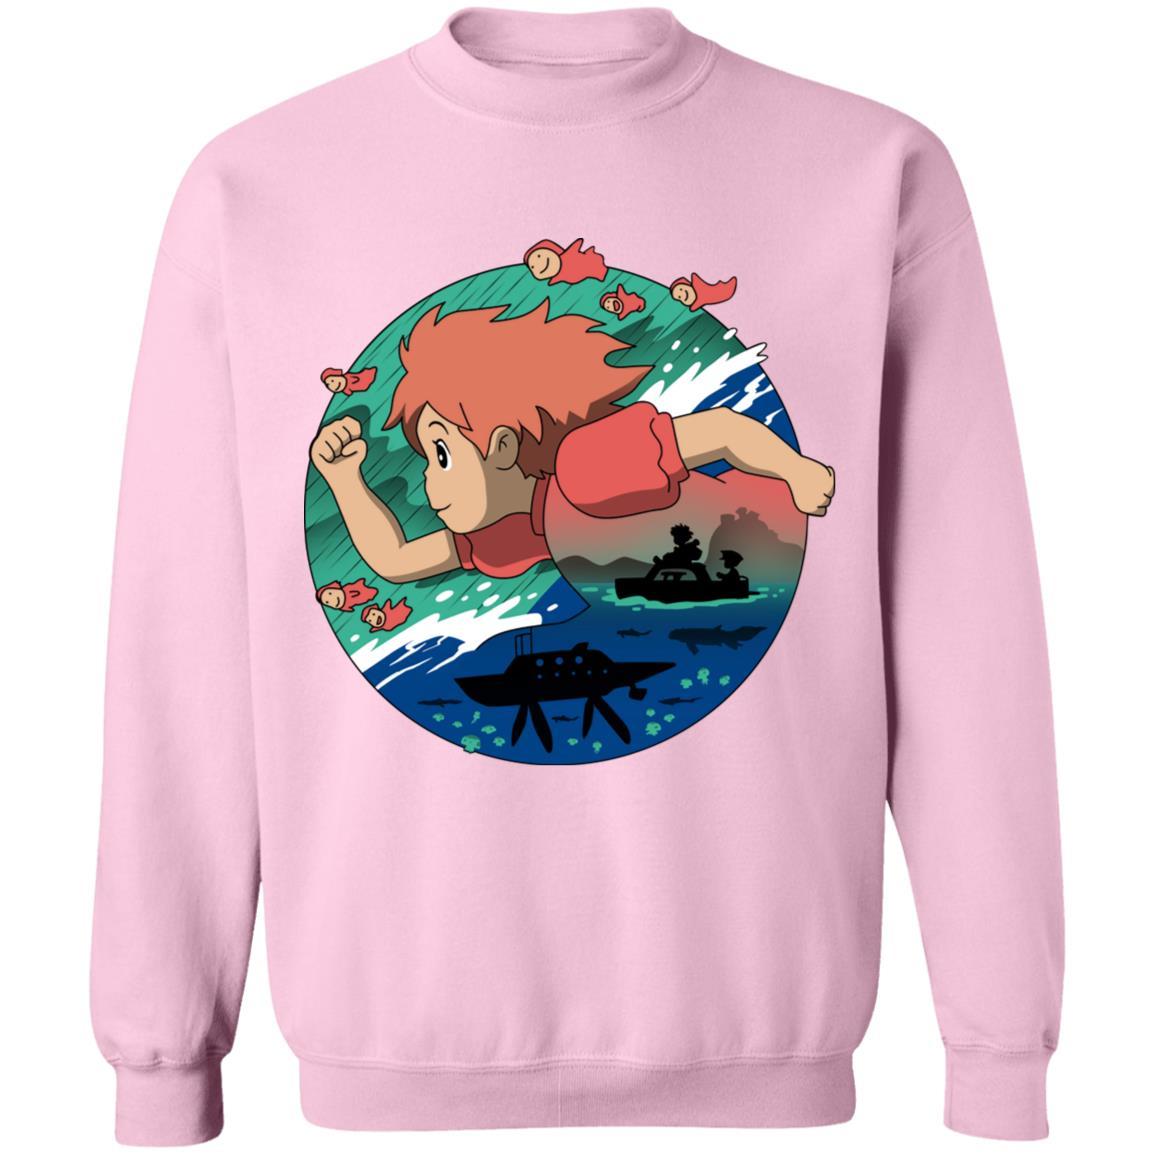 Ponyo's Journey Sweatshirt